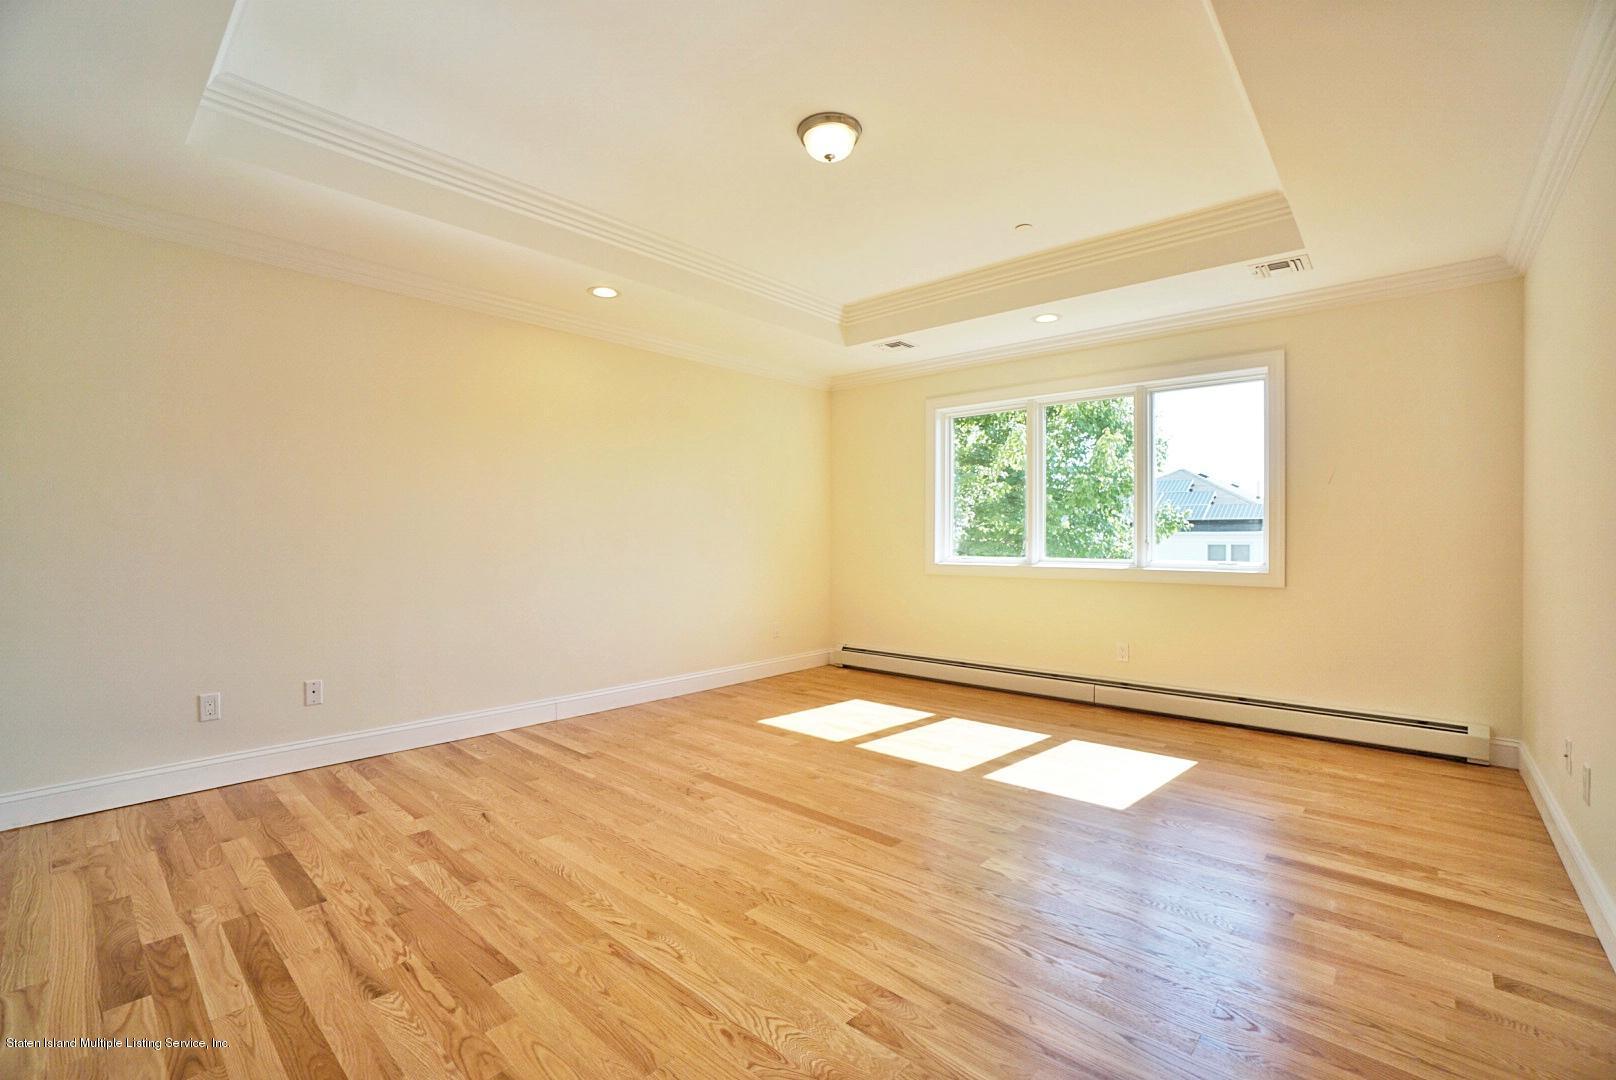 Single Family - Detached 678 Yetman Avenue  Staten Island, NY 10307, MLS-1132766-59